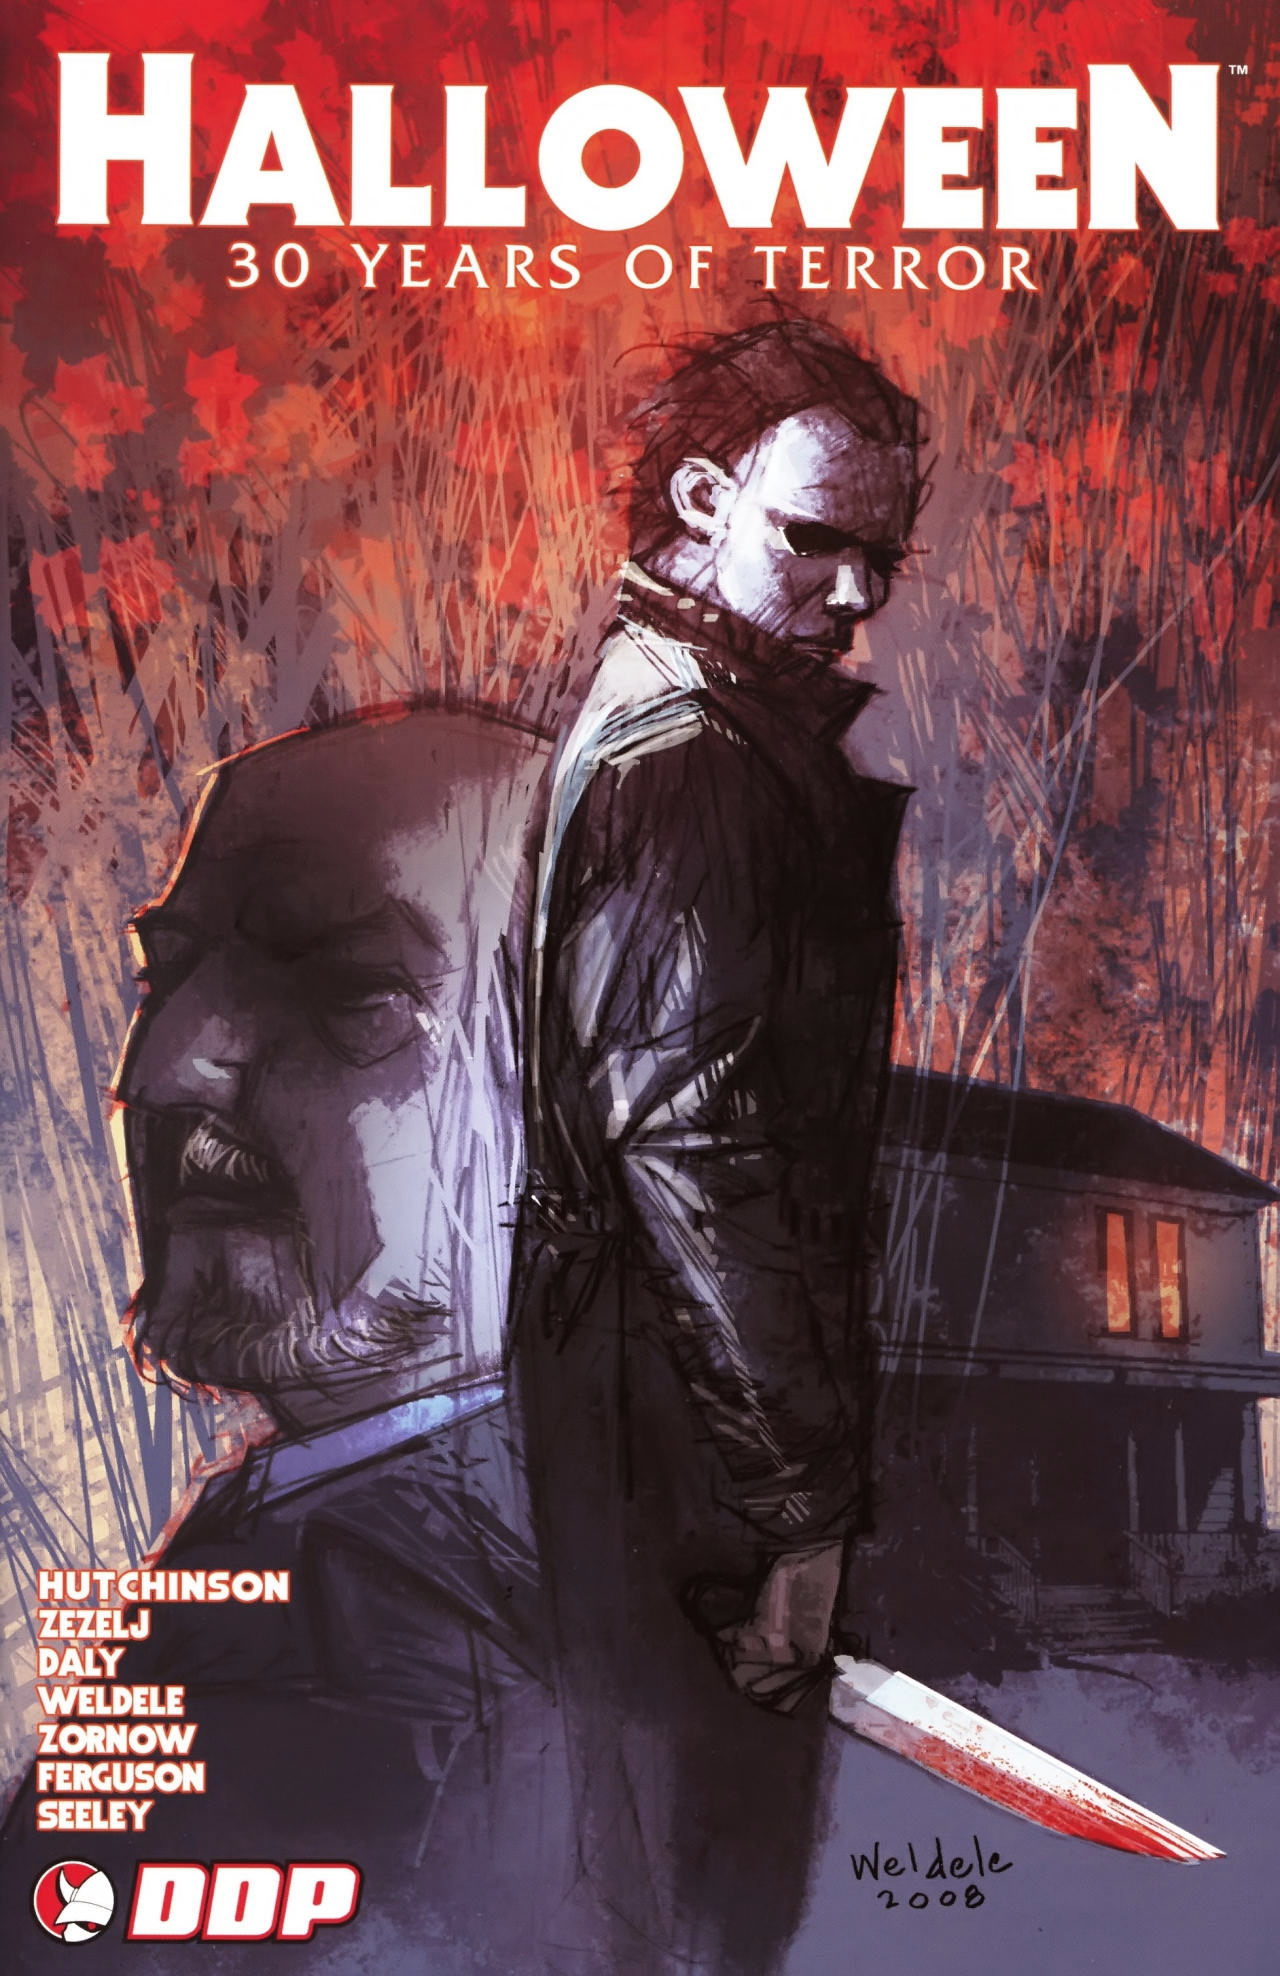 Halloween_30_Years_of_Terror_B.jpg